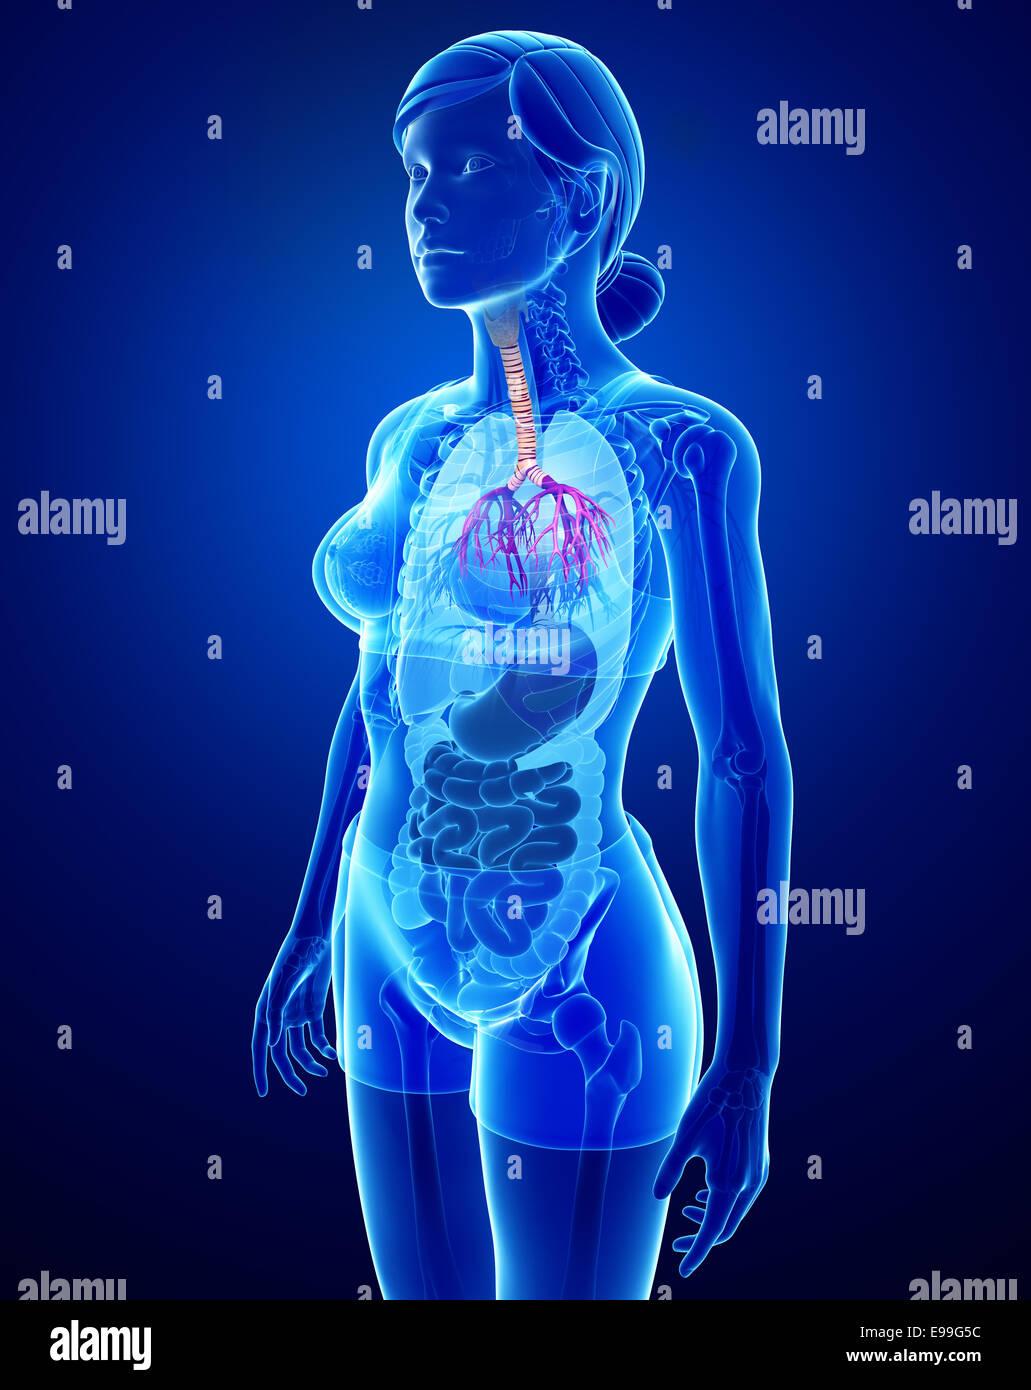 Illustration Of Female Throat Anatomy Stock Photo 74583640 Alamy